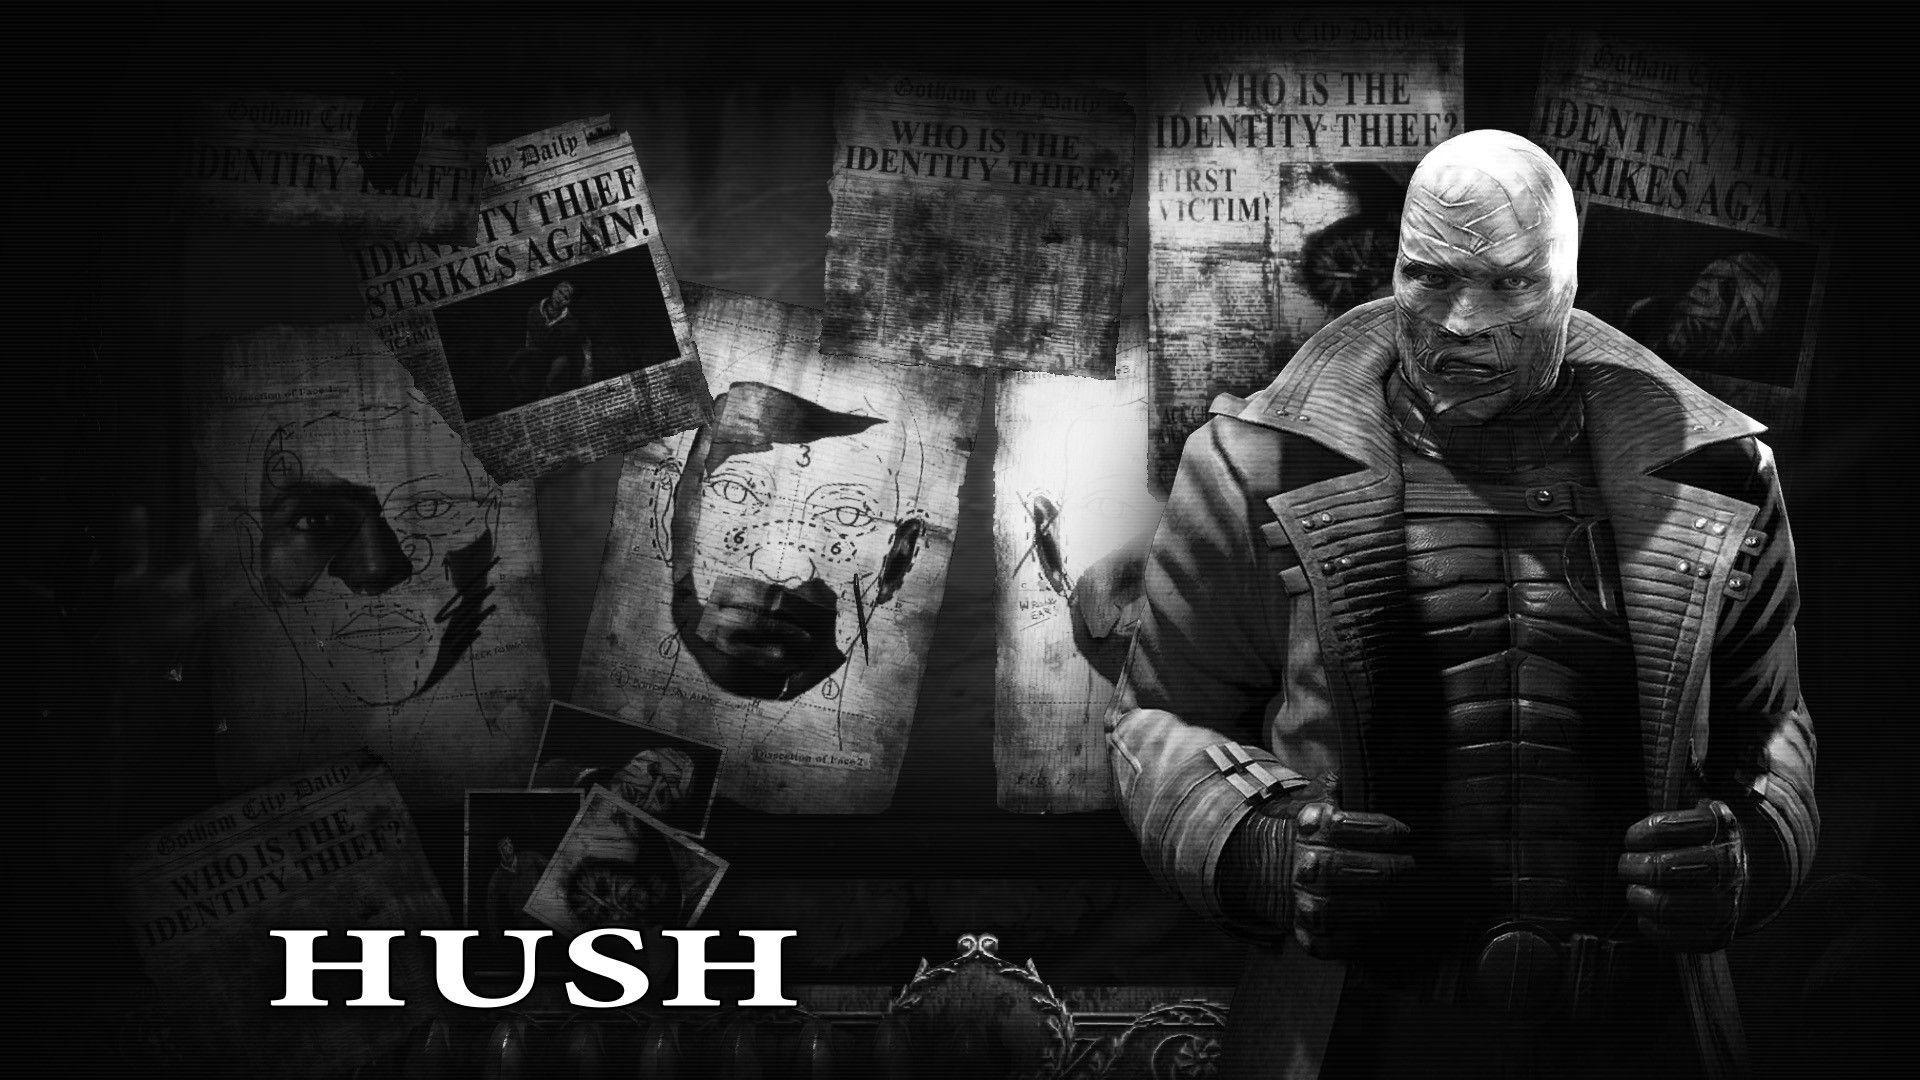 hush batman arkham city - photo #19